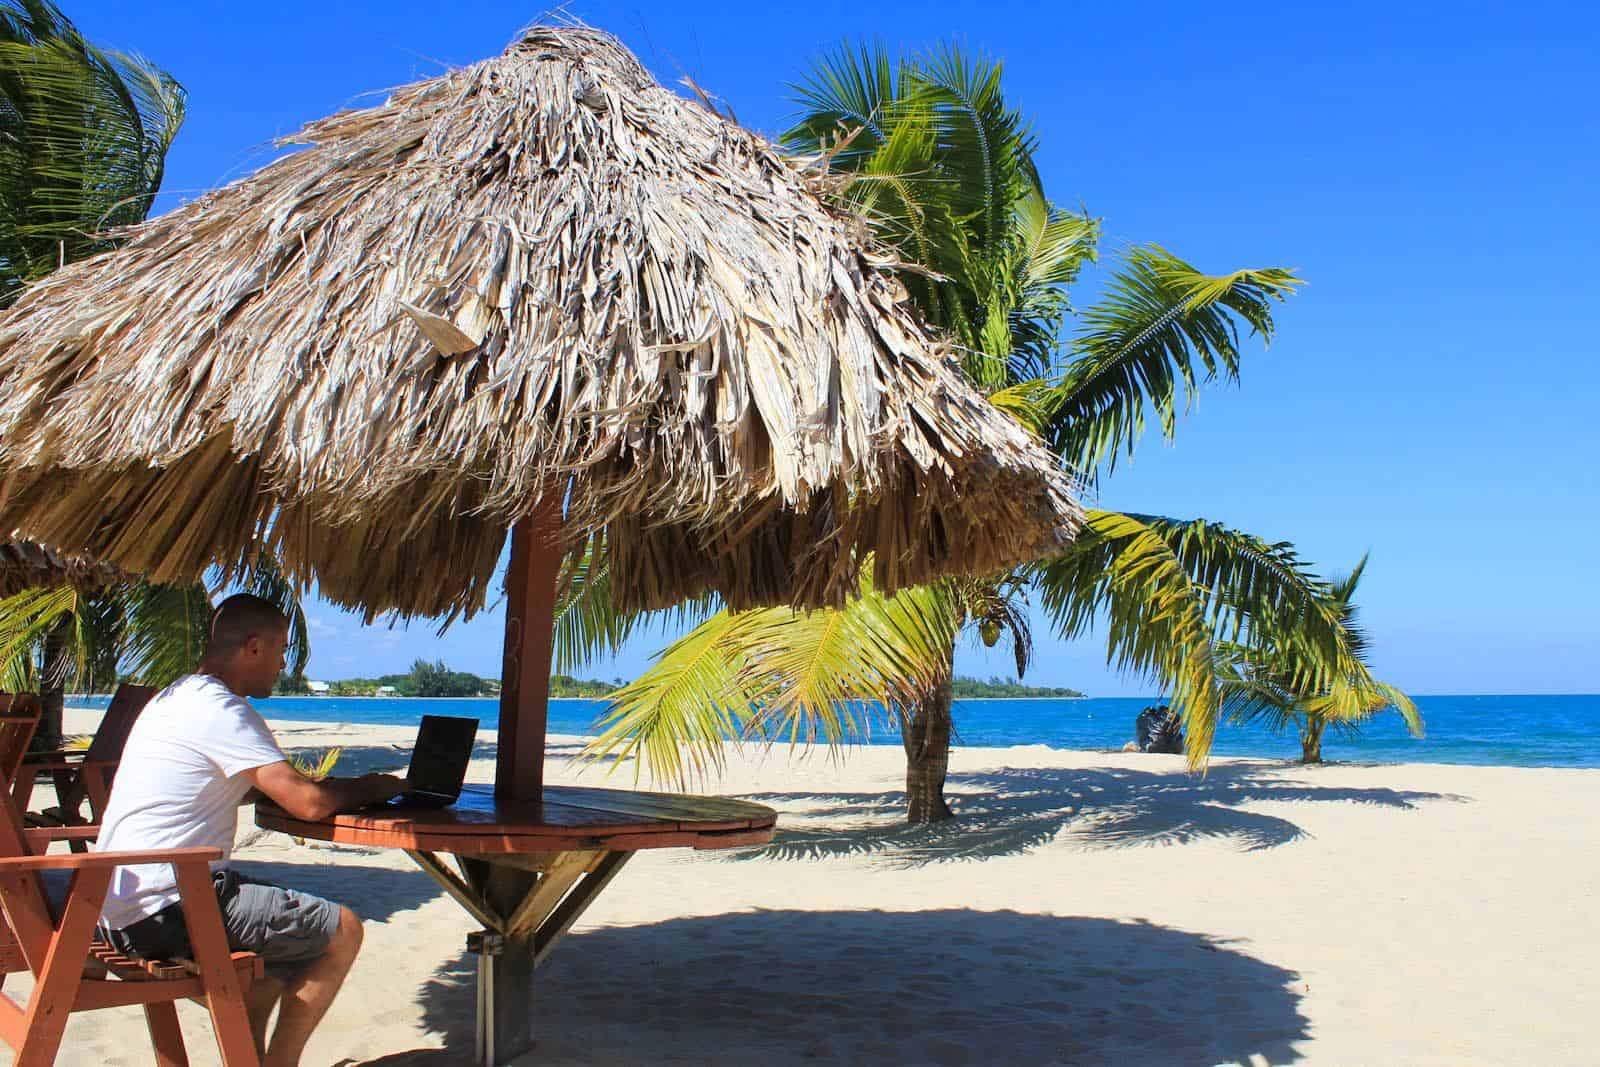 Dave working on beach